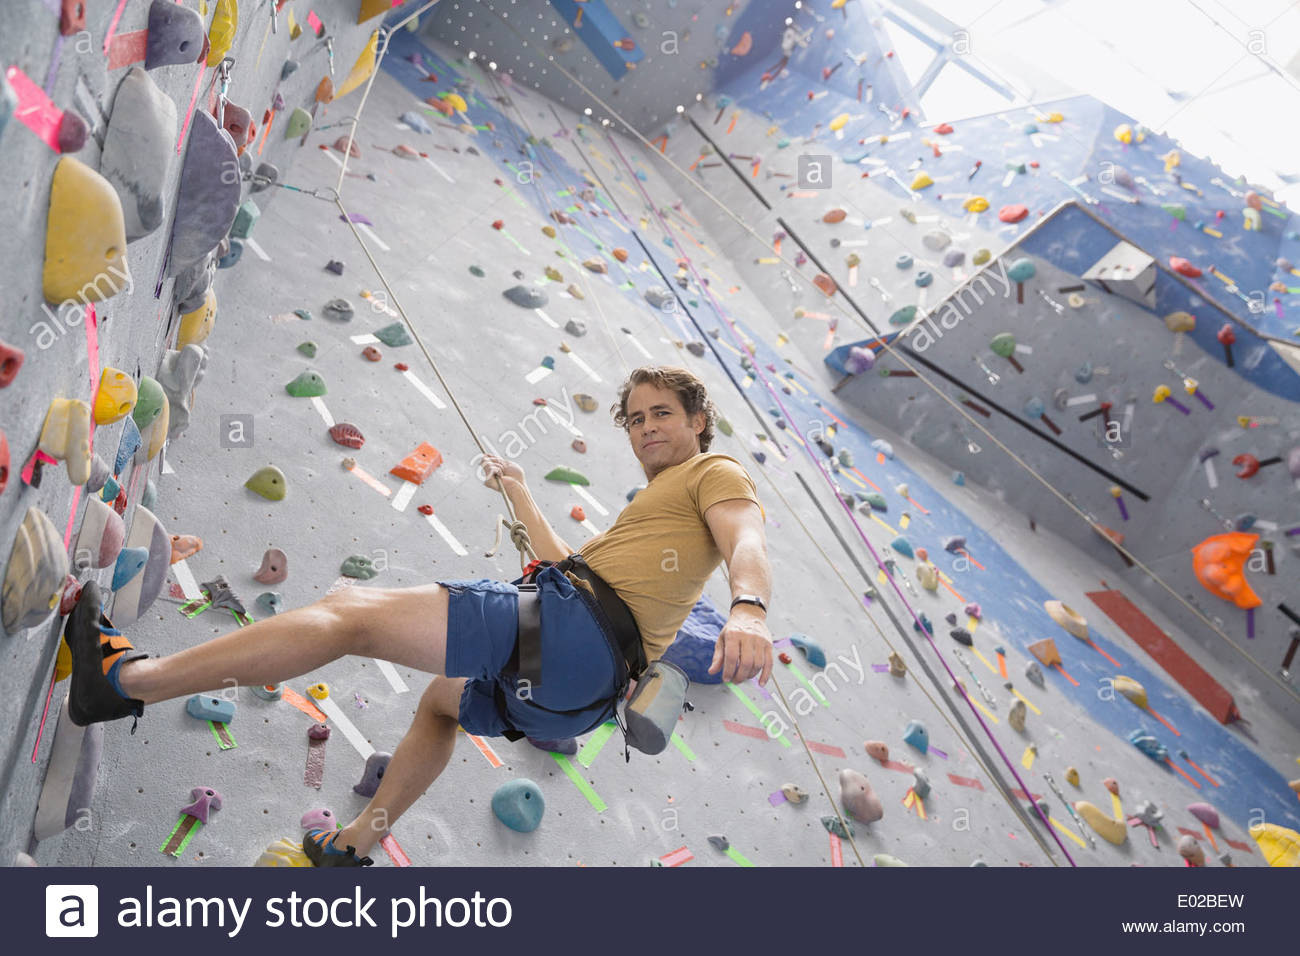 Portrait of man climbing indoor rock wall - Stock Image